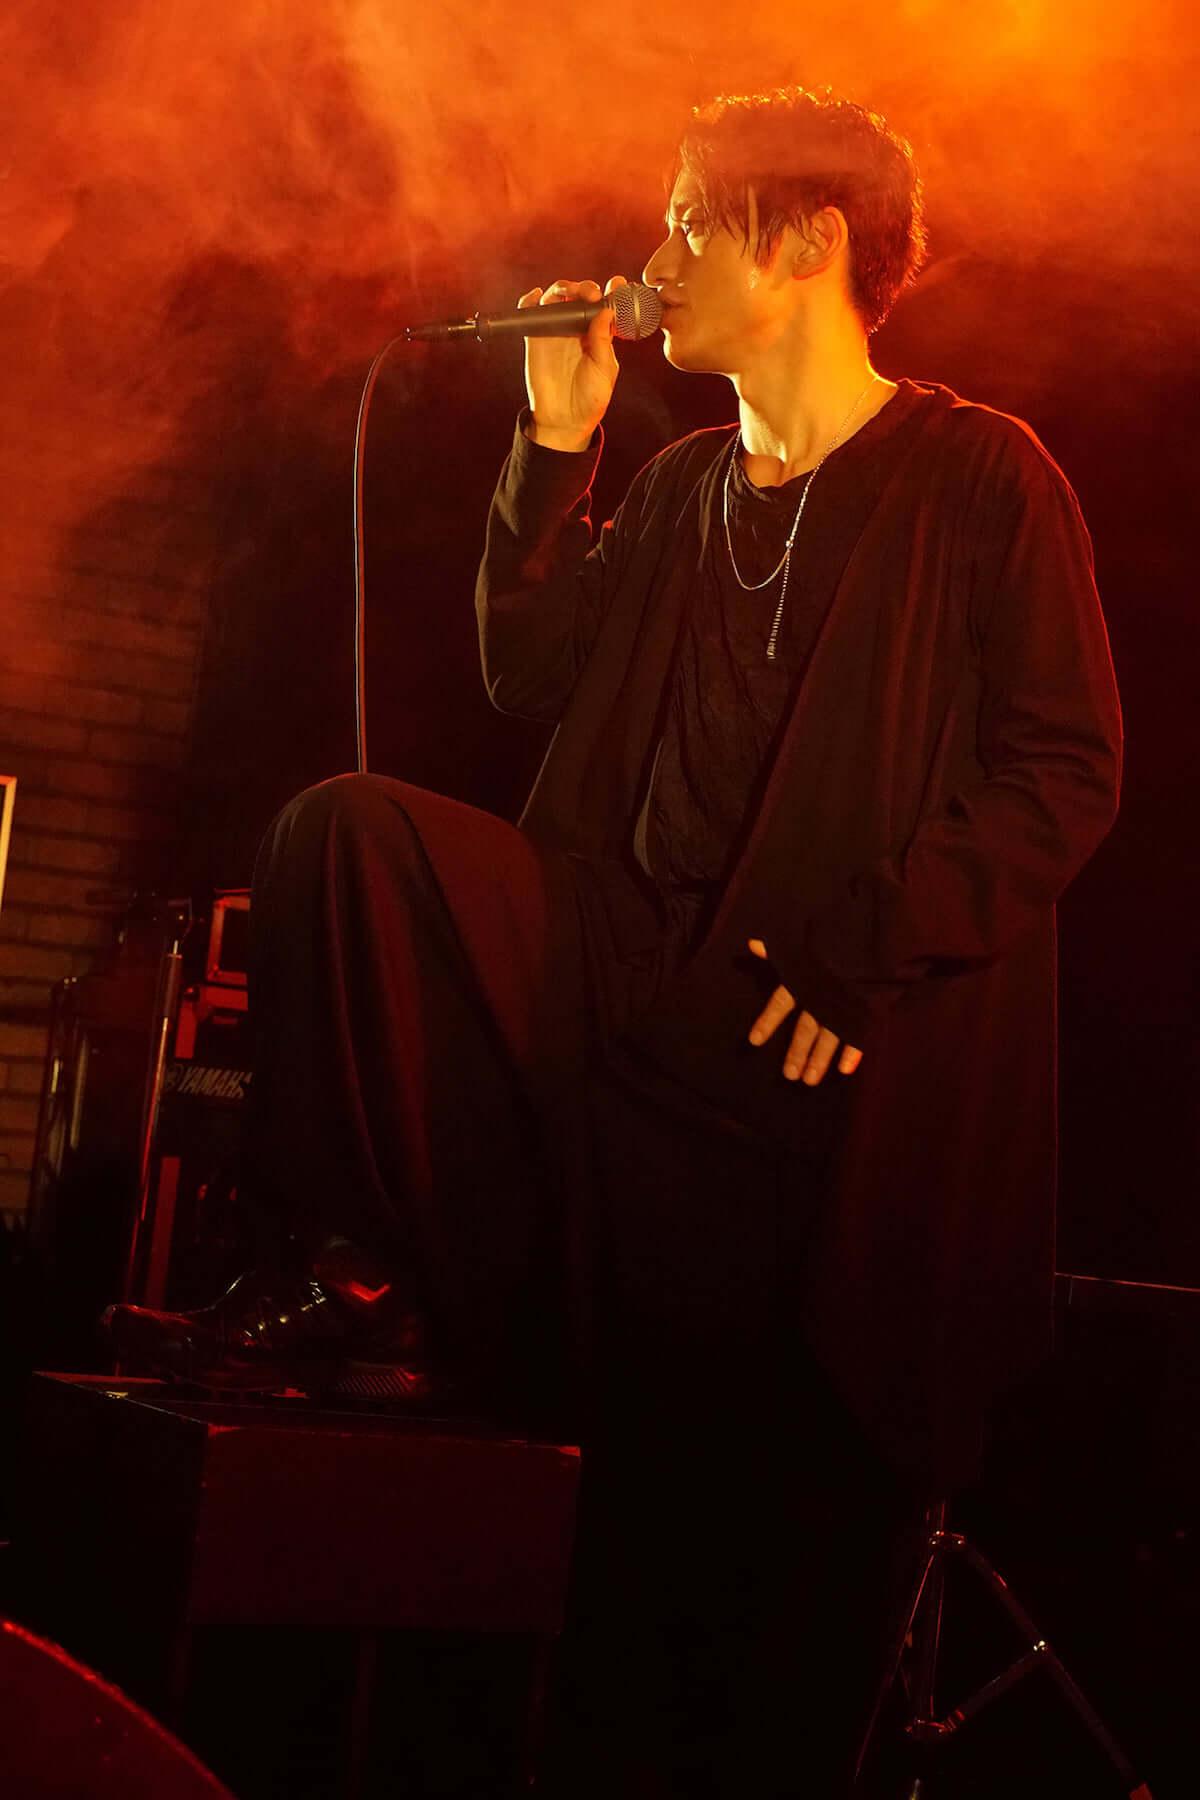 SKY-HIツアー東京・豊洲PIT公演ゲストに金子ノブアキ、THE 研究丸、SALU、Kan Sano、mabanuaらが発表! music181029_skyhi_2-1200x1800